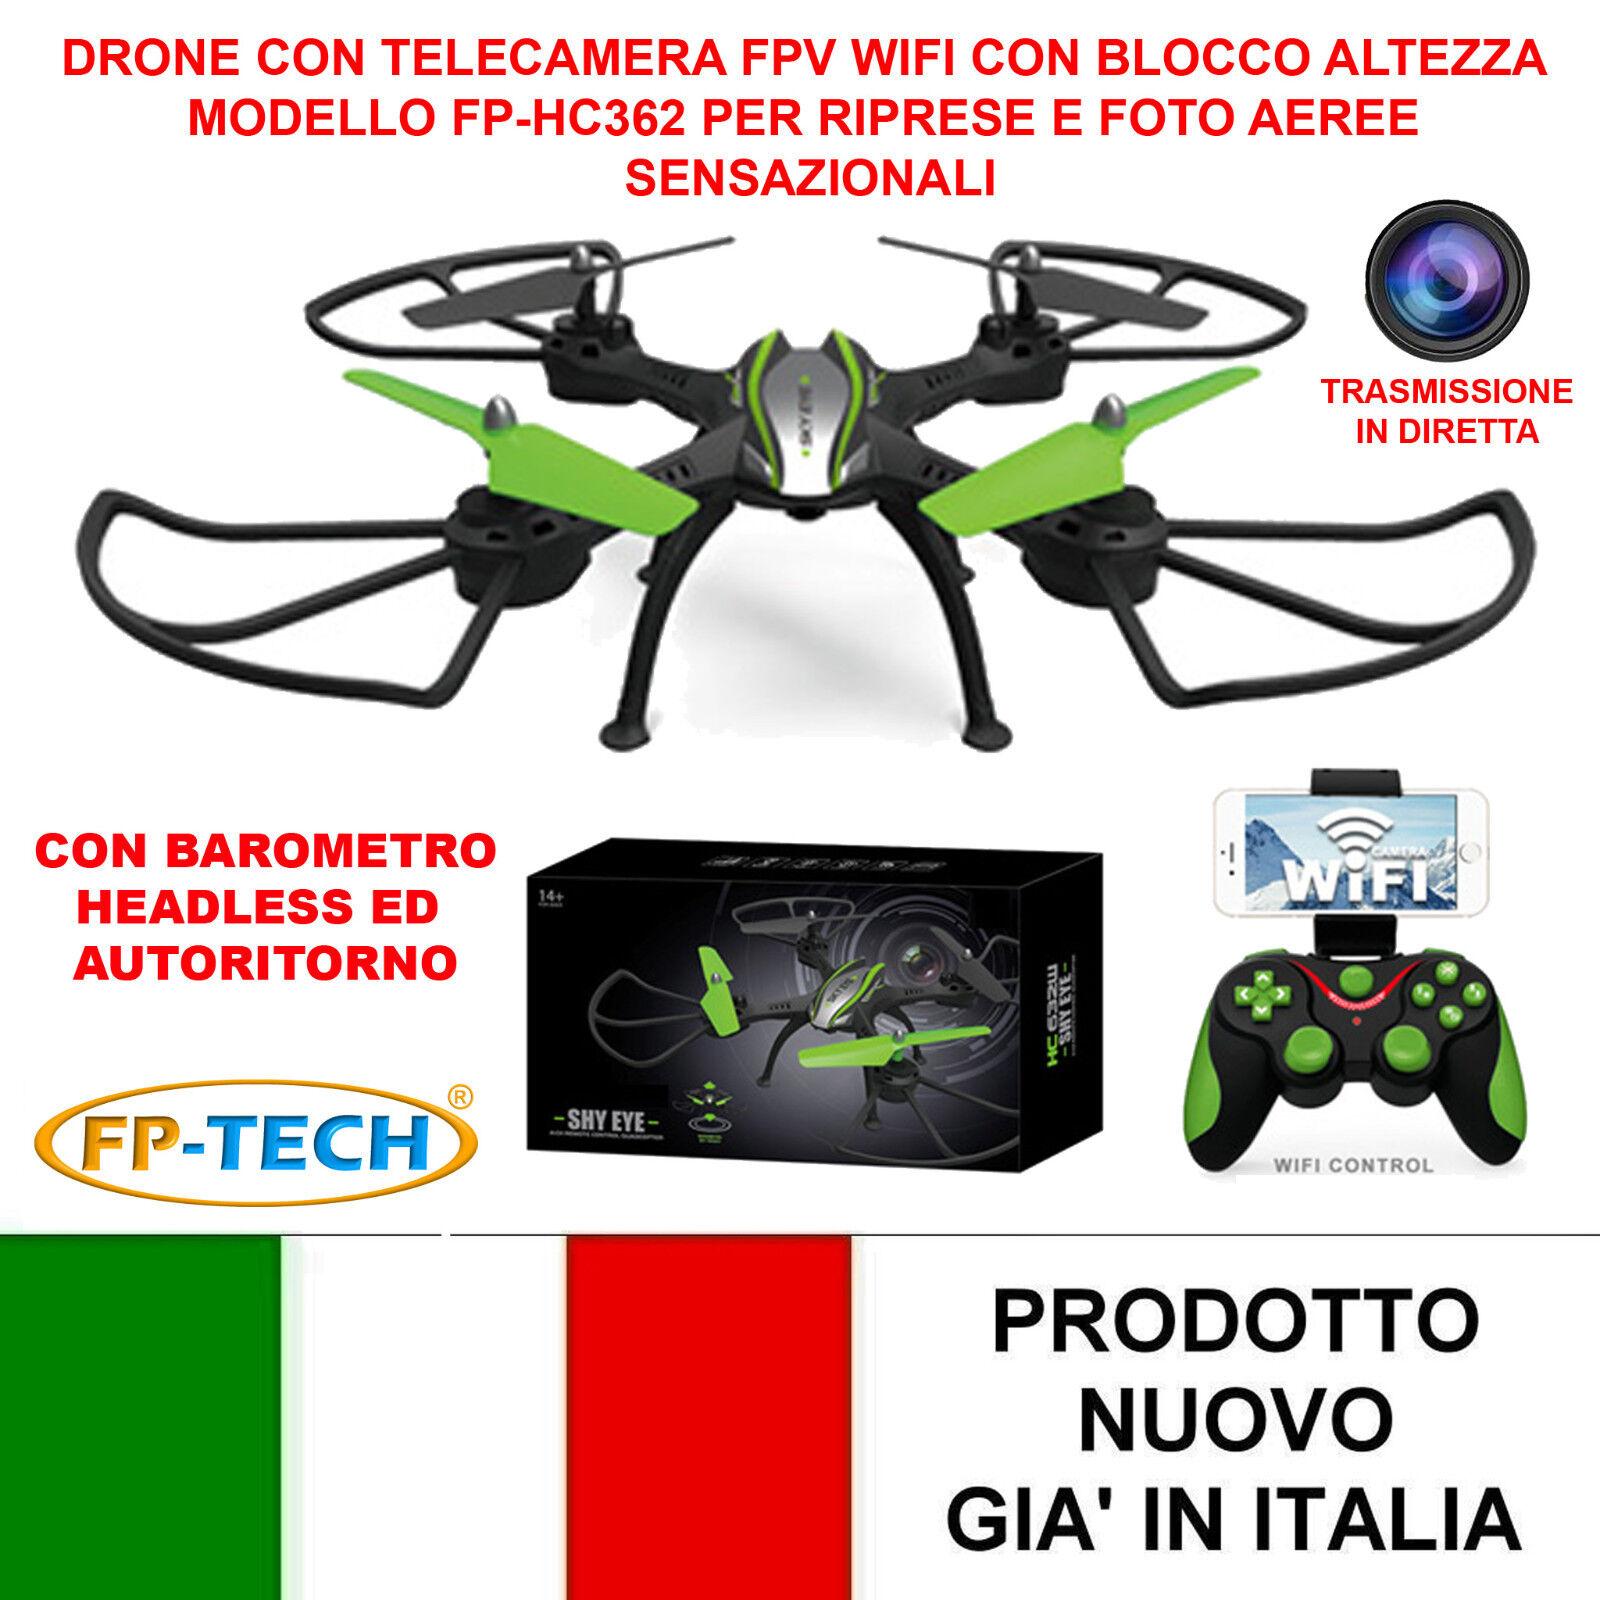 DRONE QUADRICOPTER RADICOMANDATO WIFI 2,4Ghz CAMERA HD HC632 VIDEO PHOTO USB LED